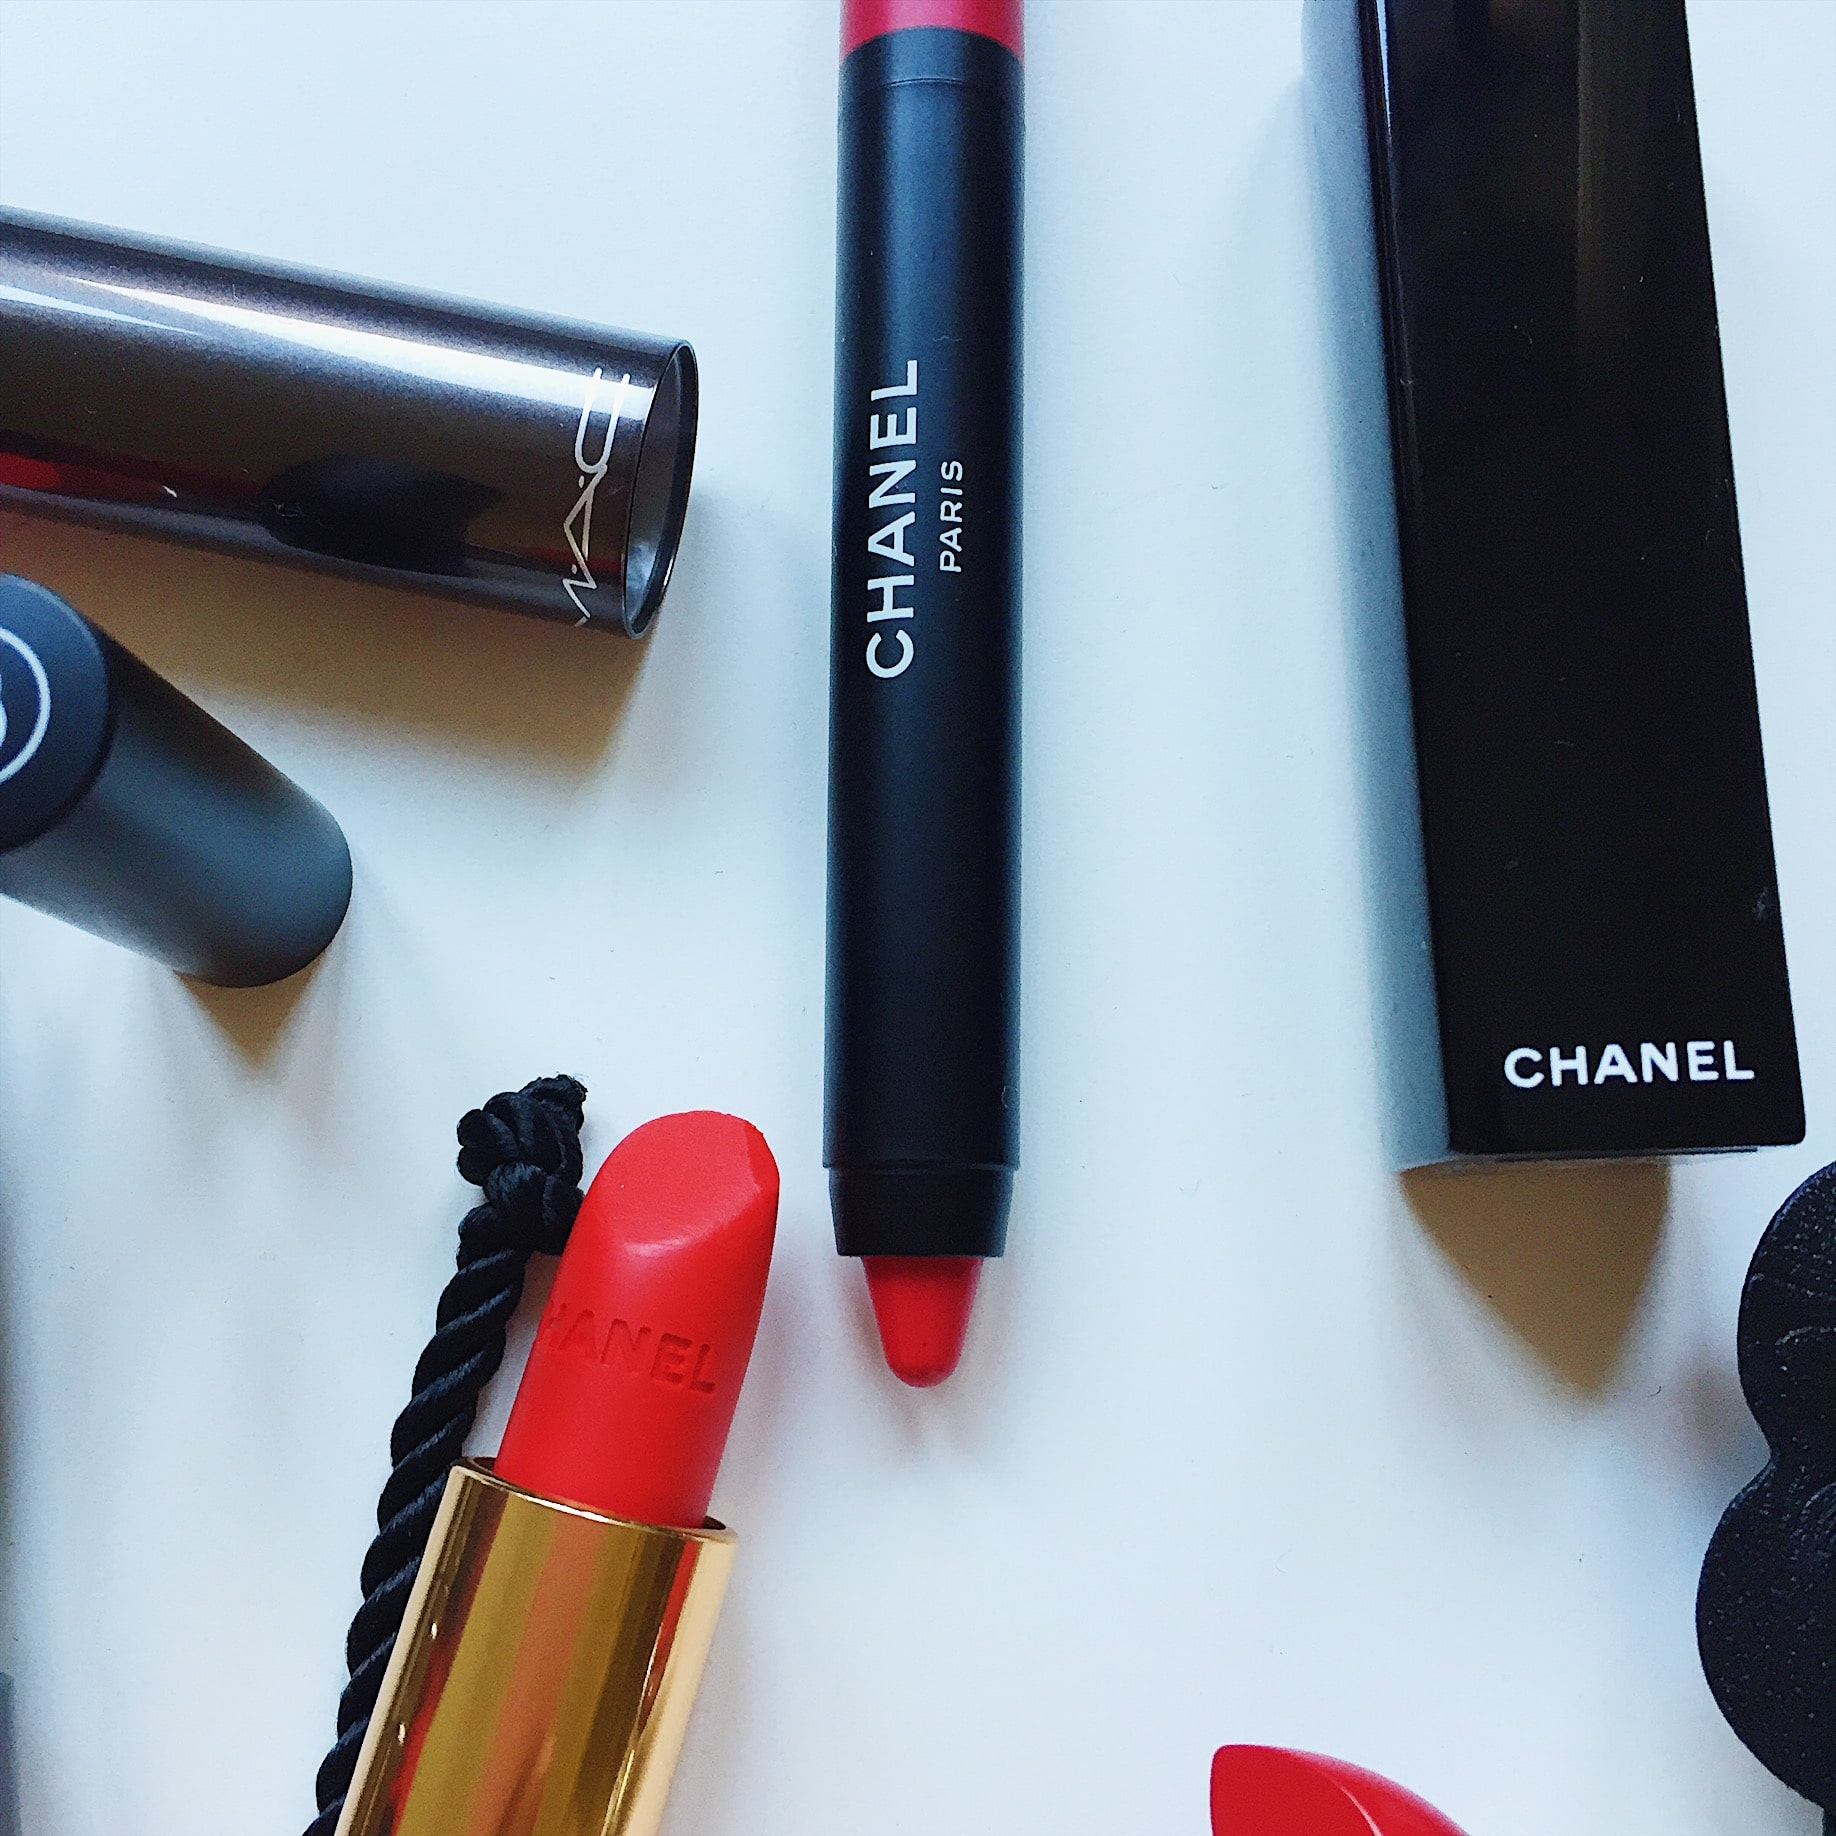 CHanel pencil and lipstick